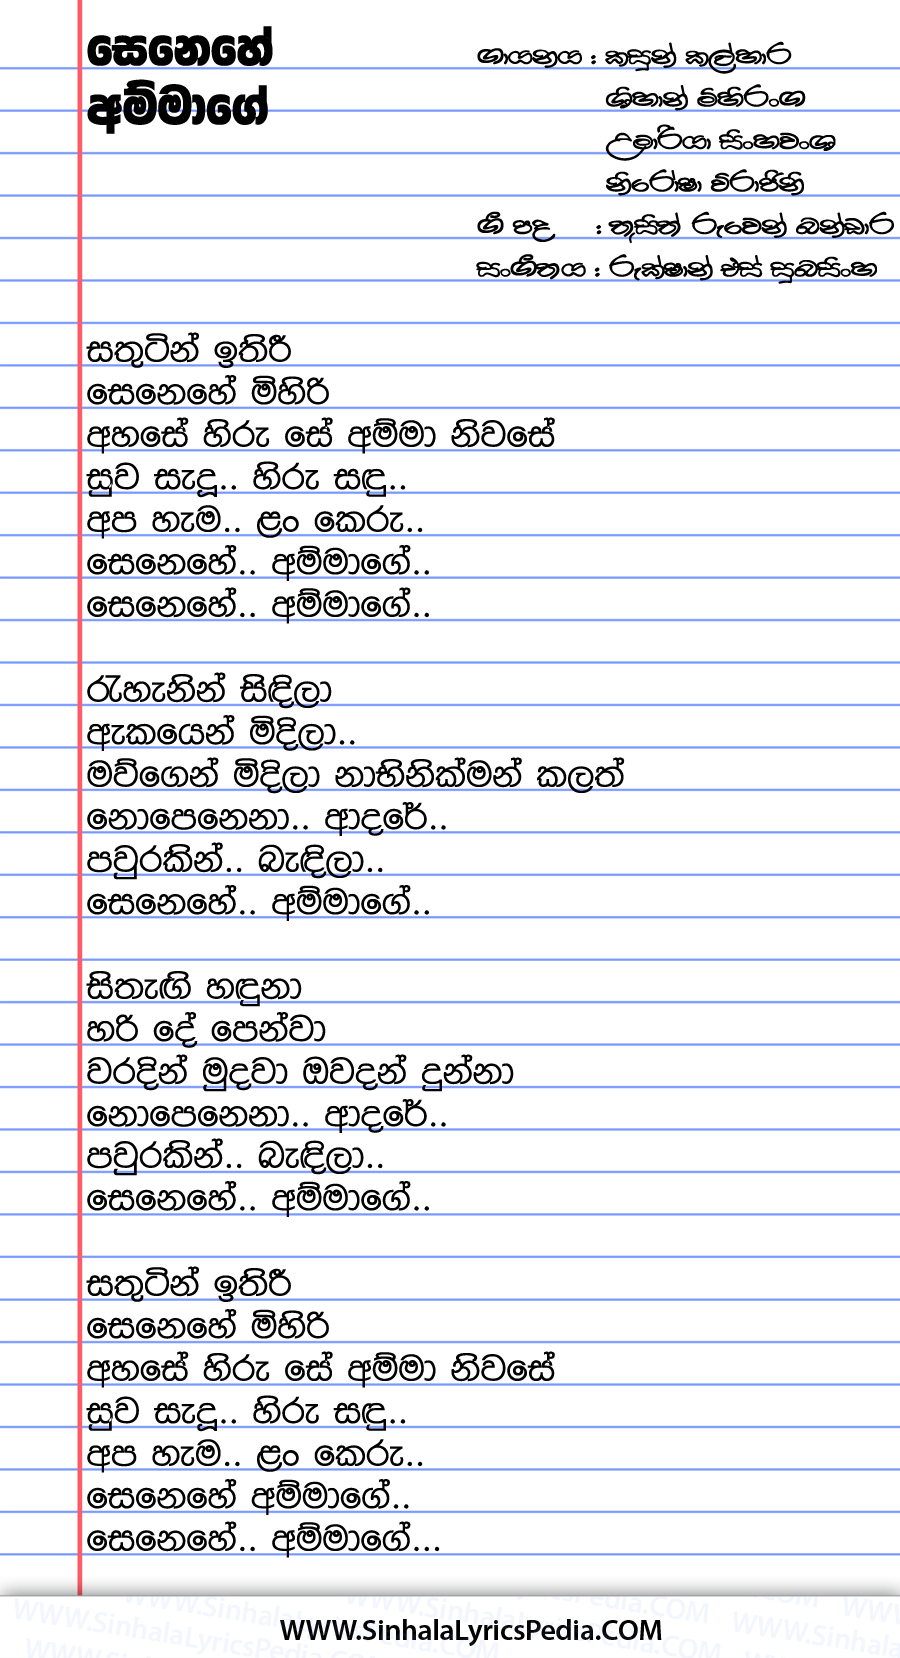 Senehe Ammage (Sathutin Ithiri Senehe Mihiri) Song Lyrics